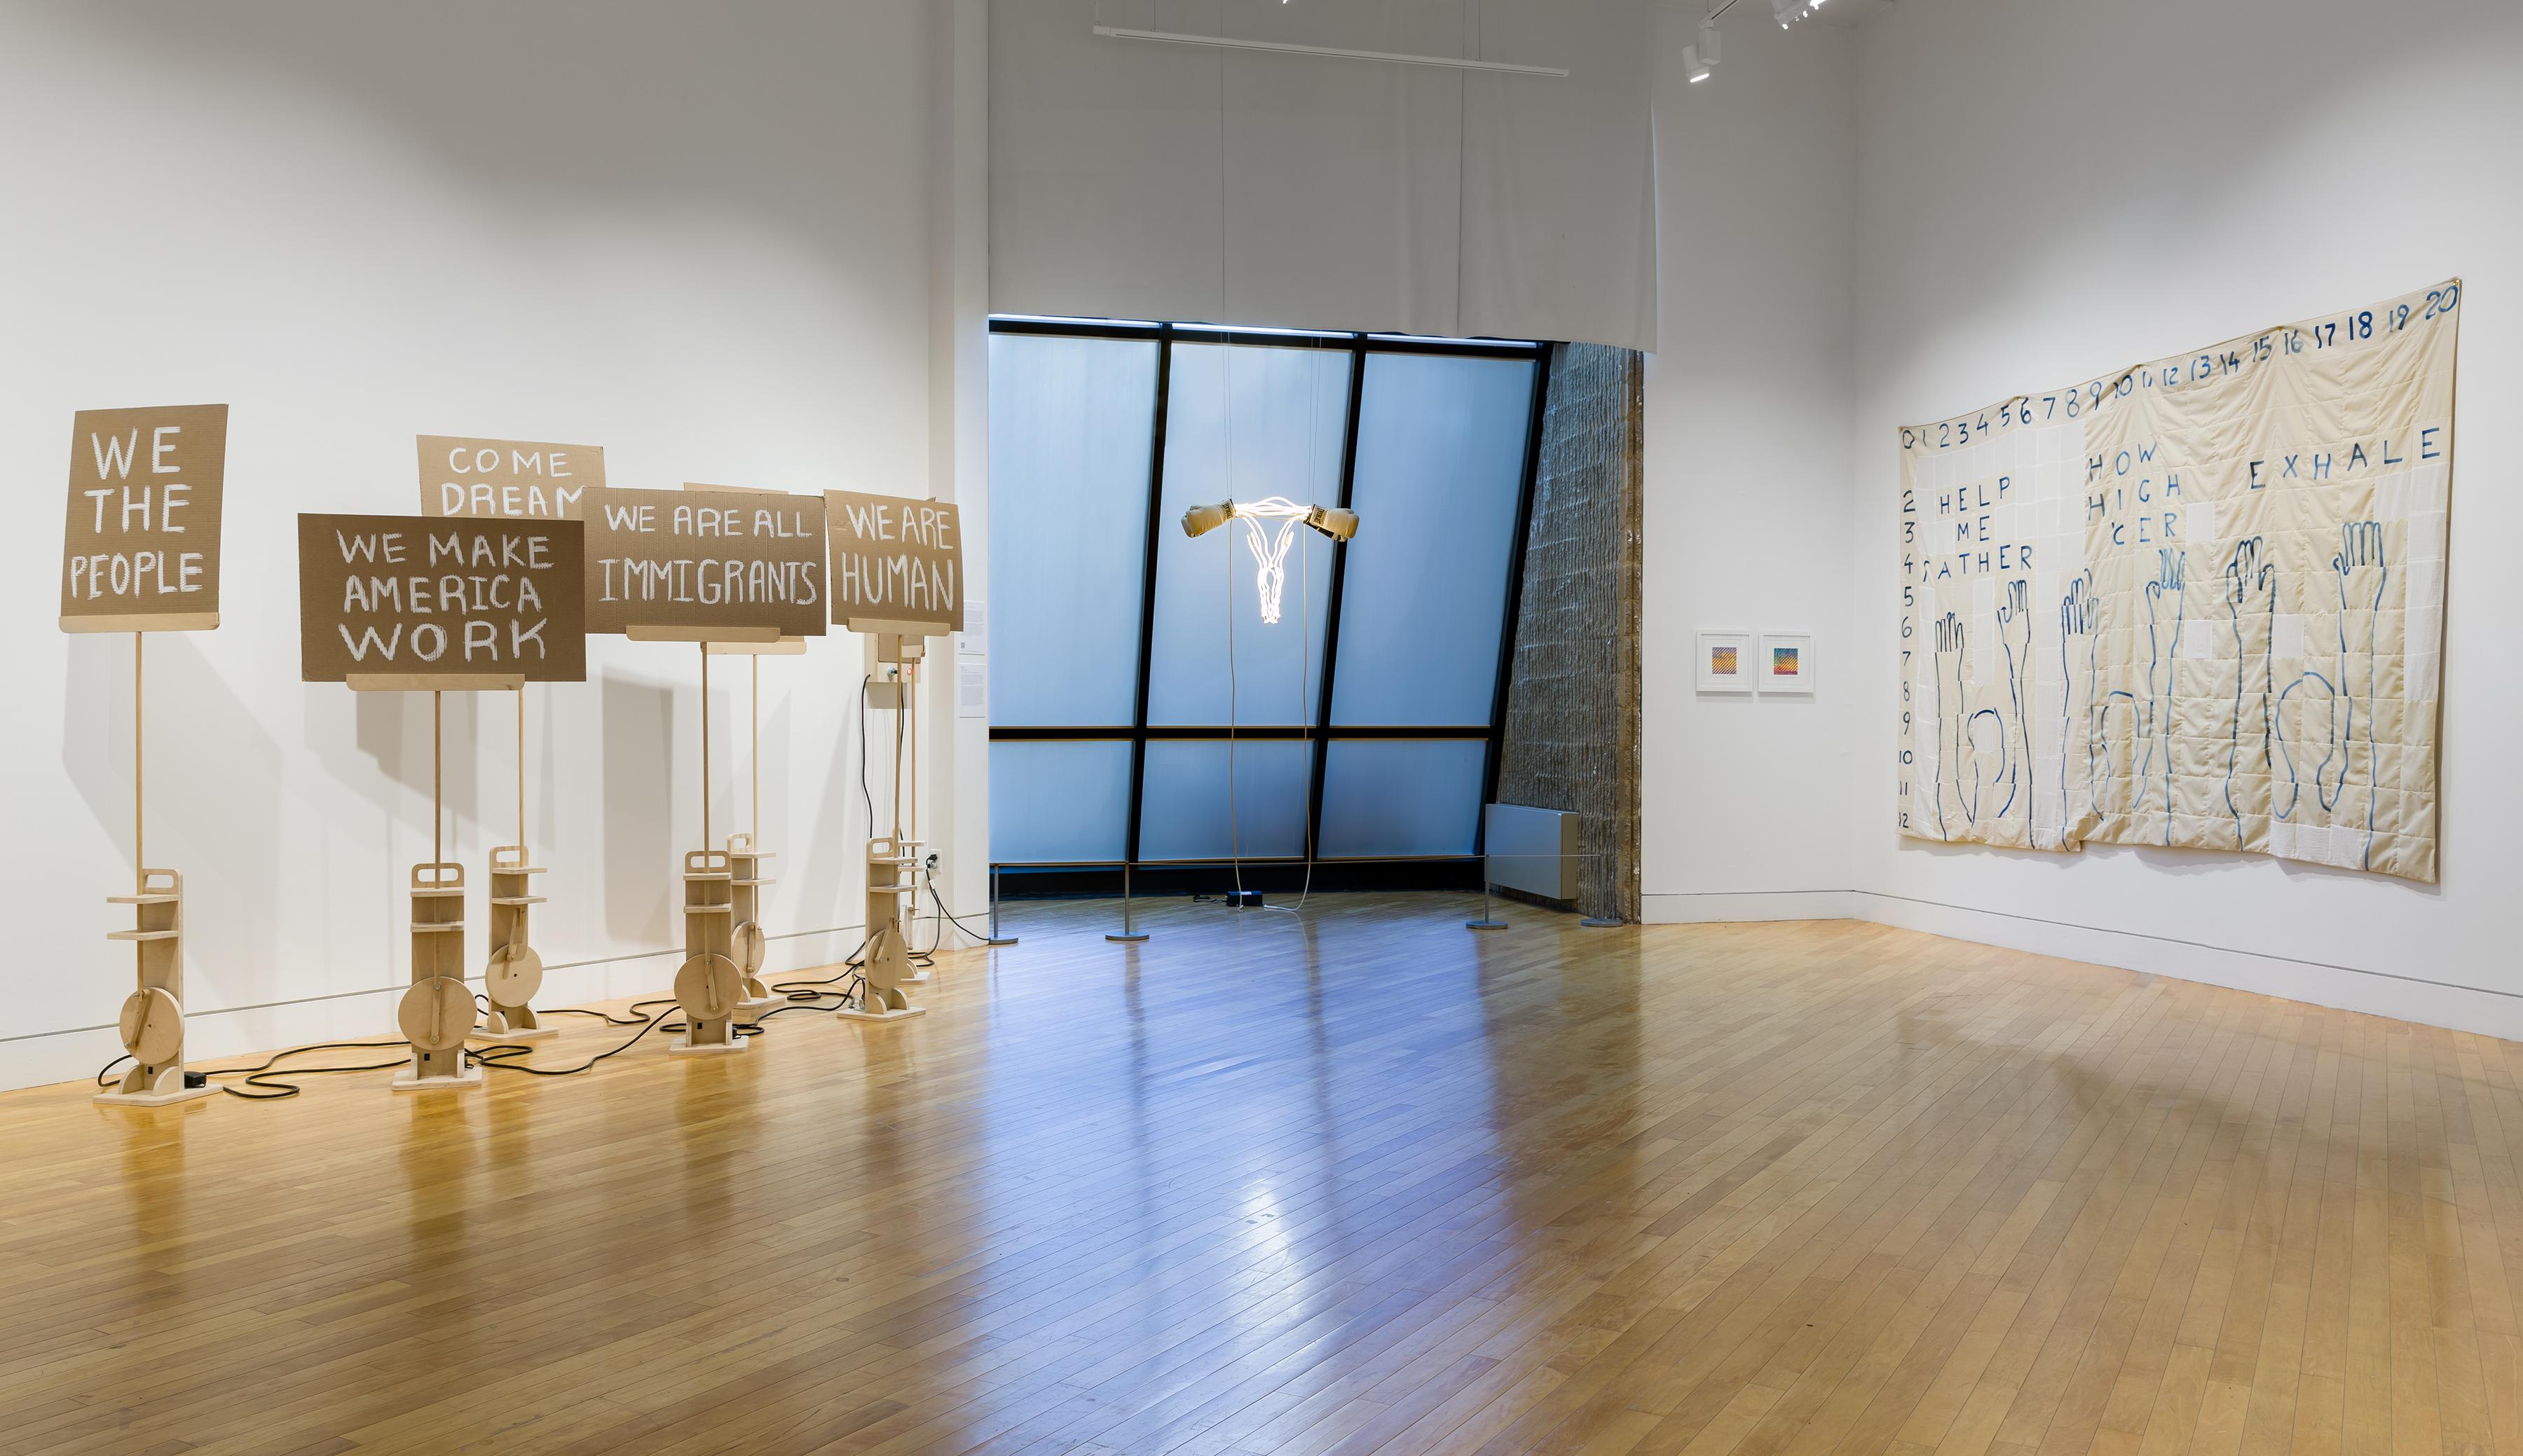 Art exhibition at NJ Visual Arts Center Zoe Buckman